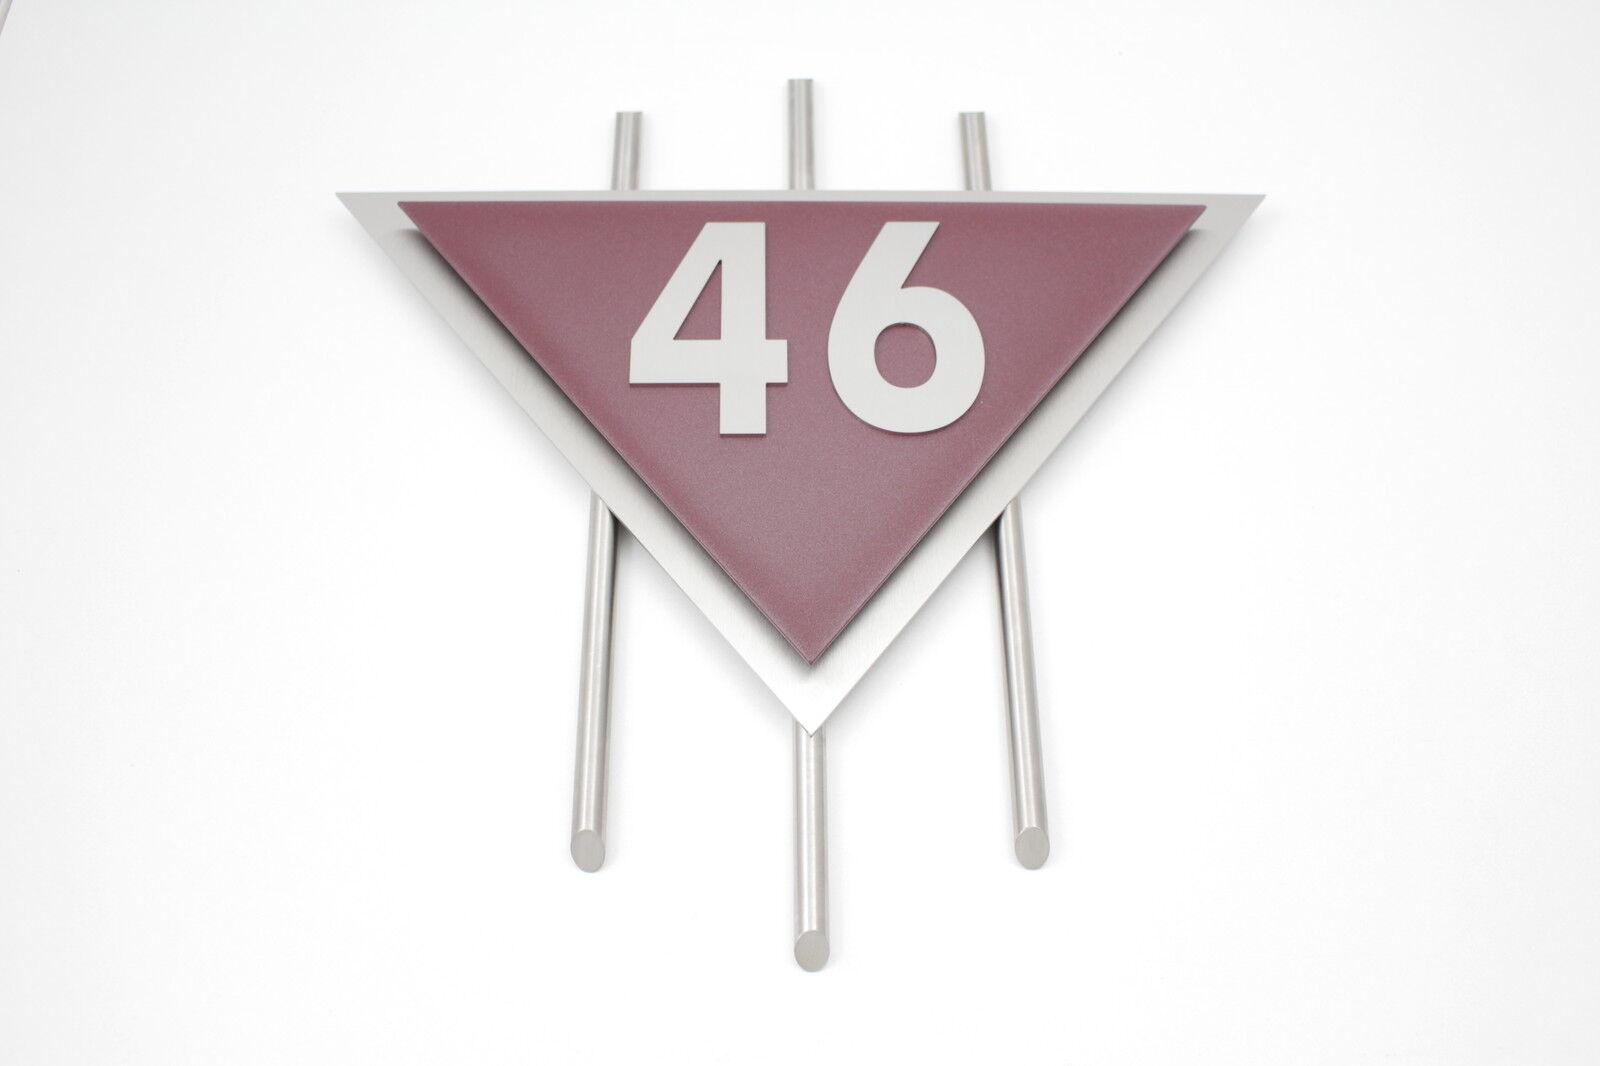 Hausnummer Edelstahl Bordeaux 2-stellig Design Venus 0-9 a-h a-h a-h A-H V2A Zierstangen | Umweltfreundlich  | Düsseldorf Online Shop  | ein guter Ruf in der Welt  0883d0